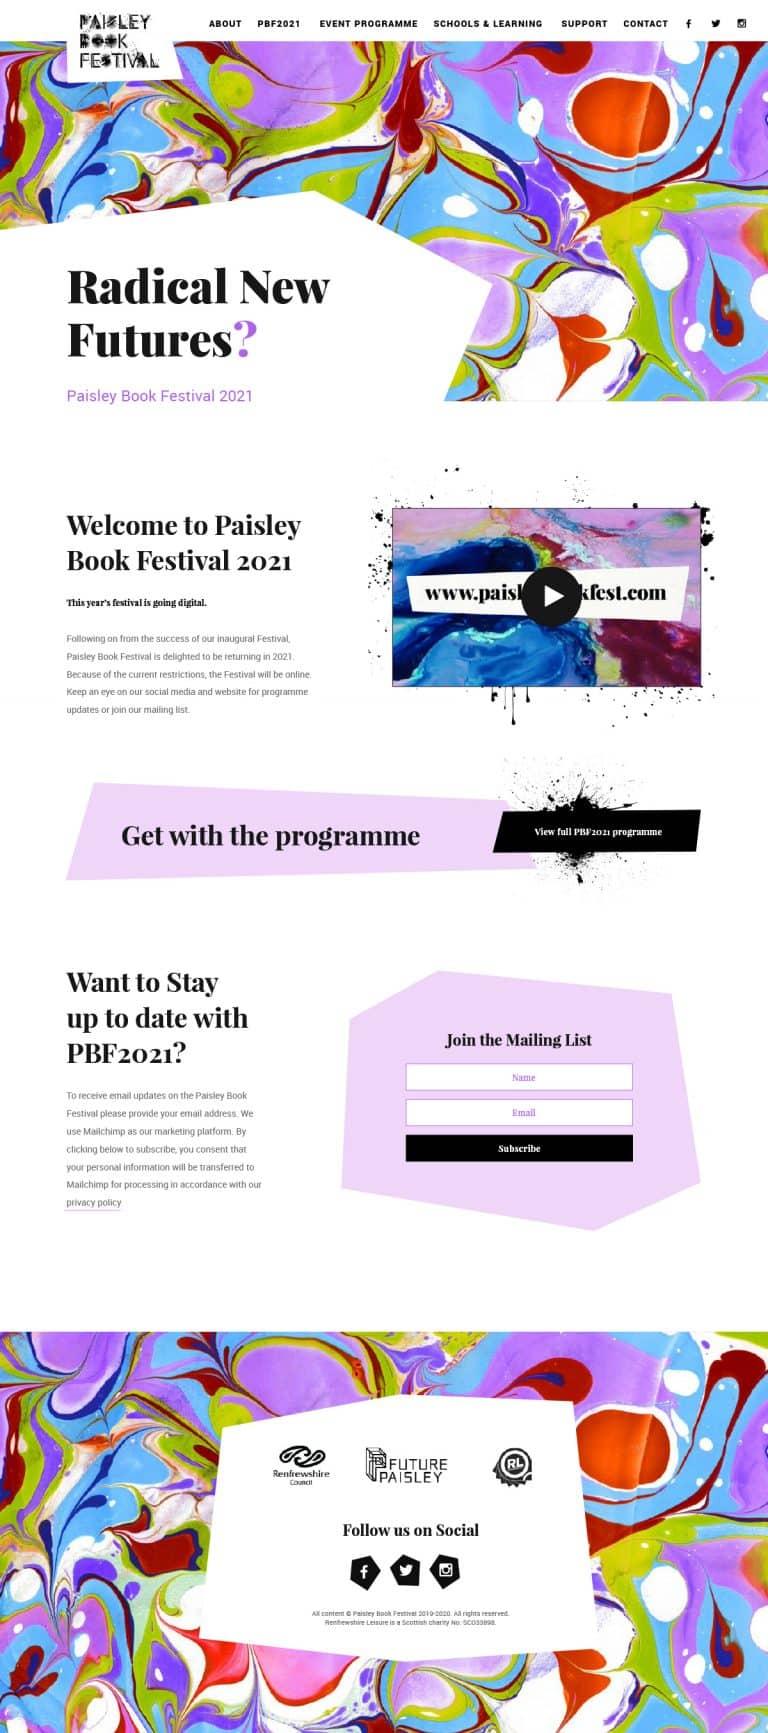 website design for Paisley Book Festival 2021